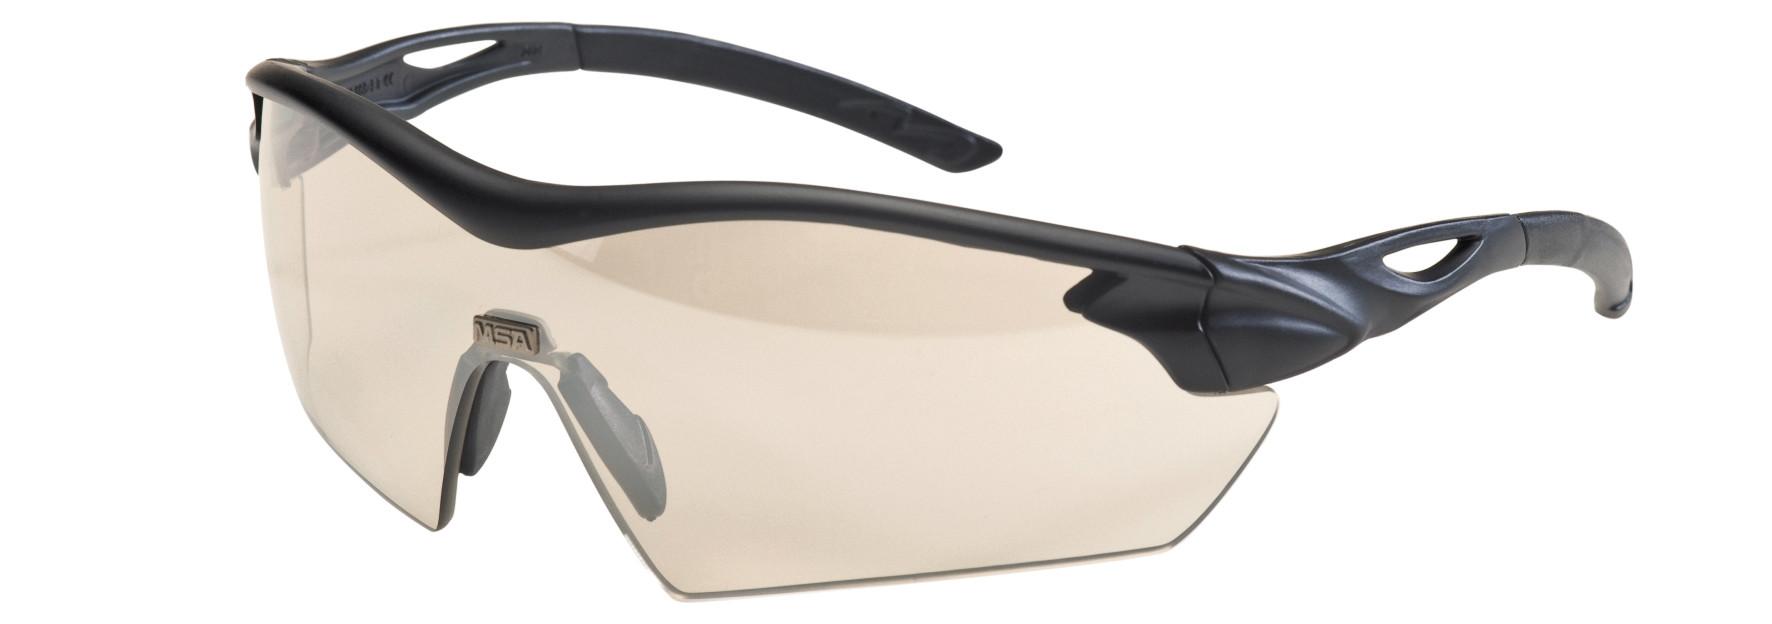 12ST MSA Veiligheidsbril Racers goud spiegellens